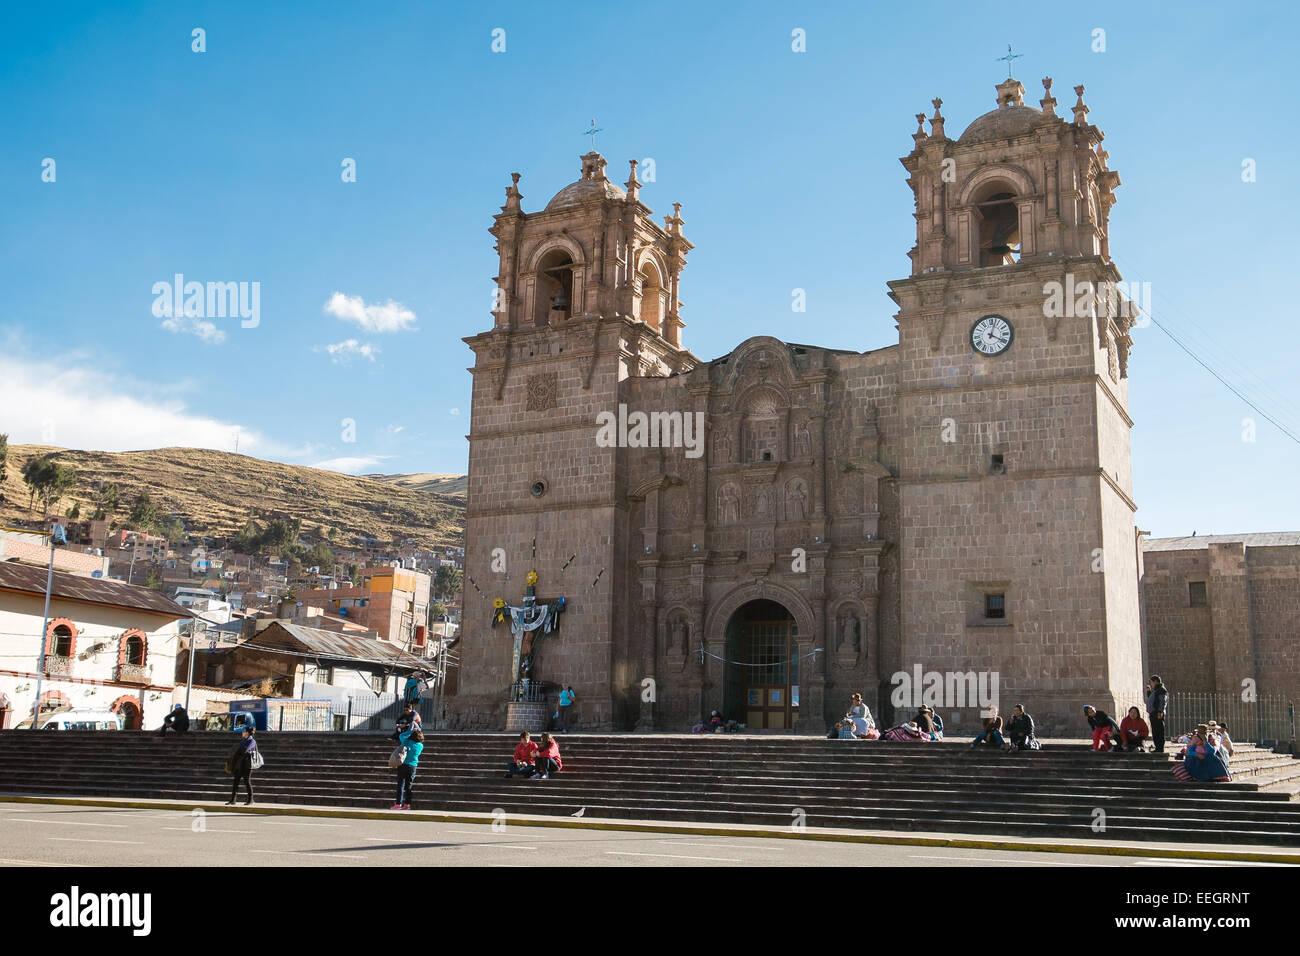 Puno Cathedral in Plaza de Armas, Puno, Peru Stock Photo